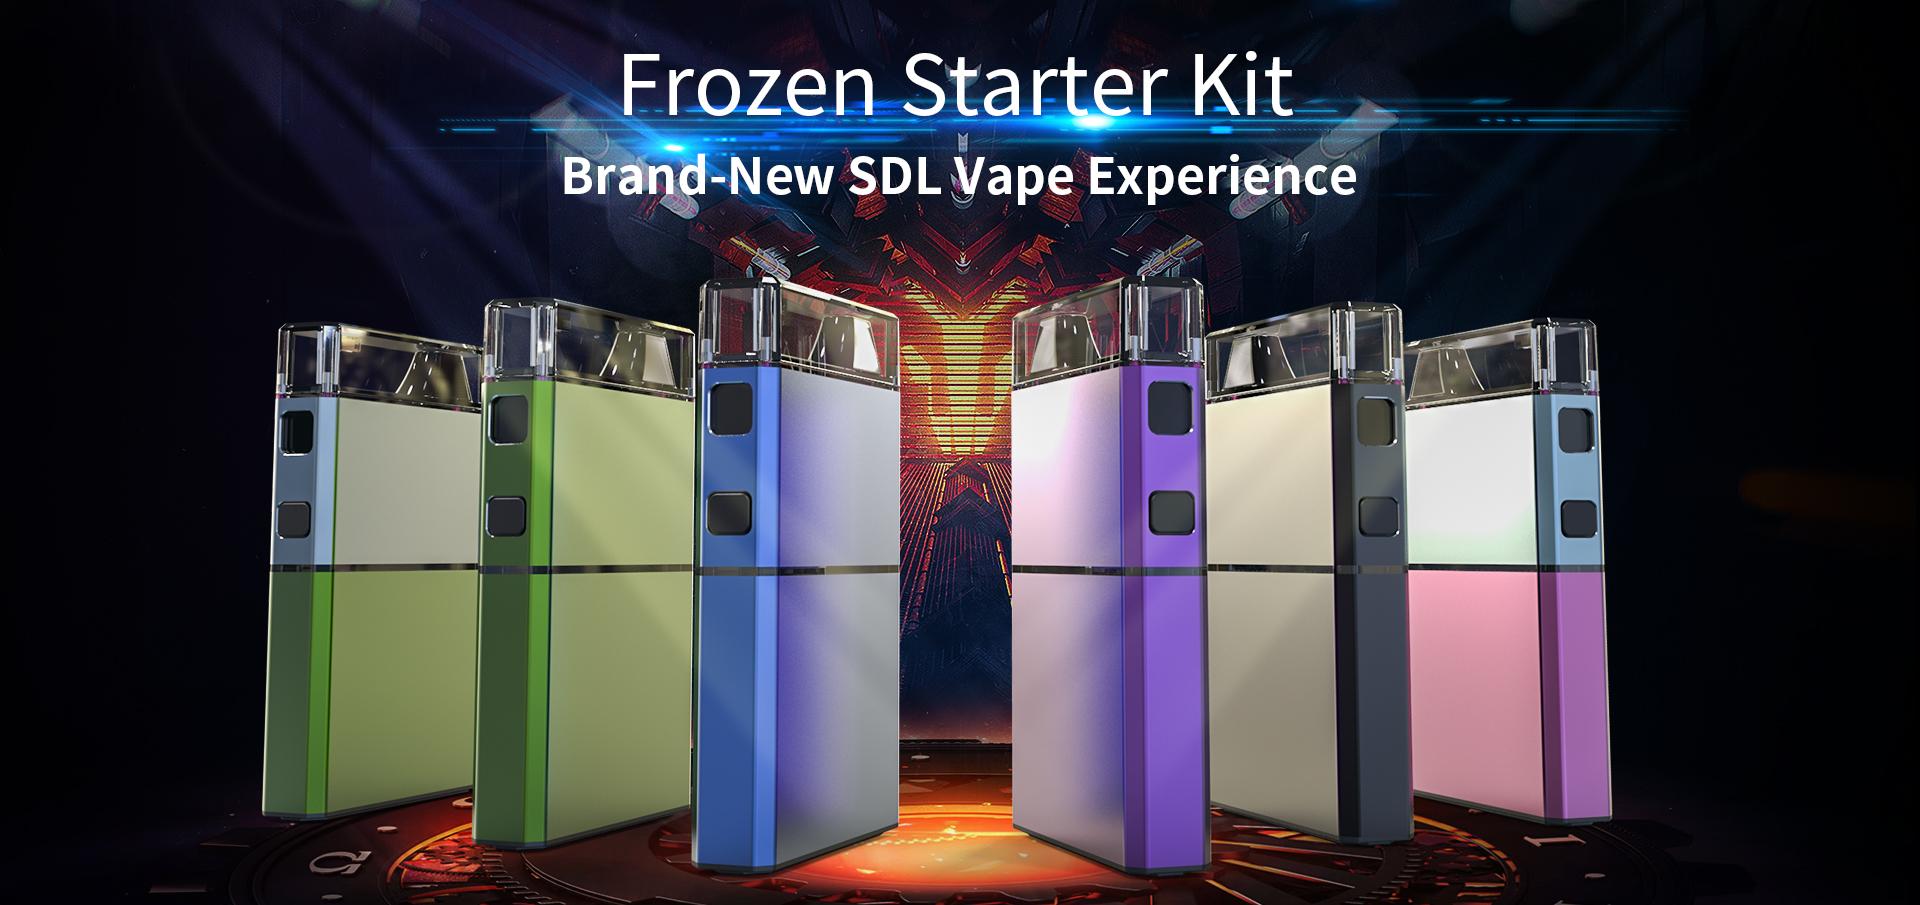 FMCC Frozen Starter Kit Features 1